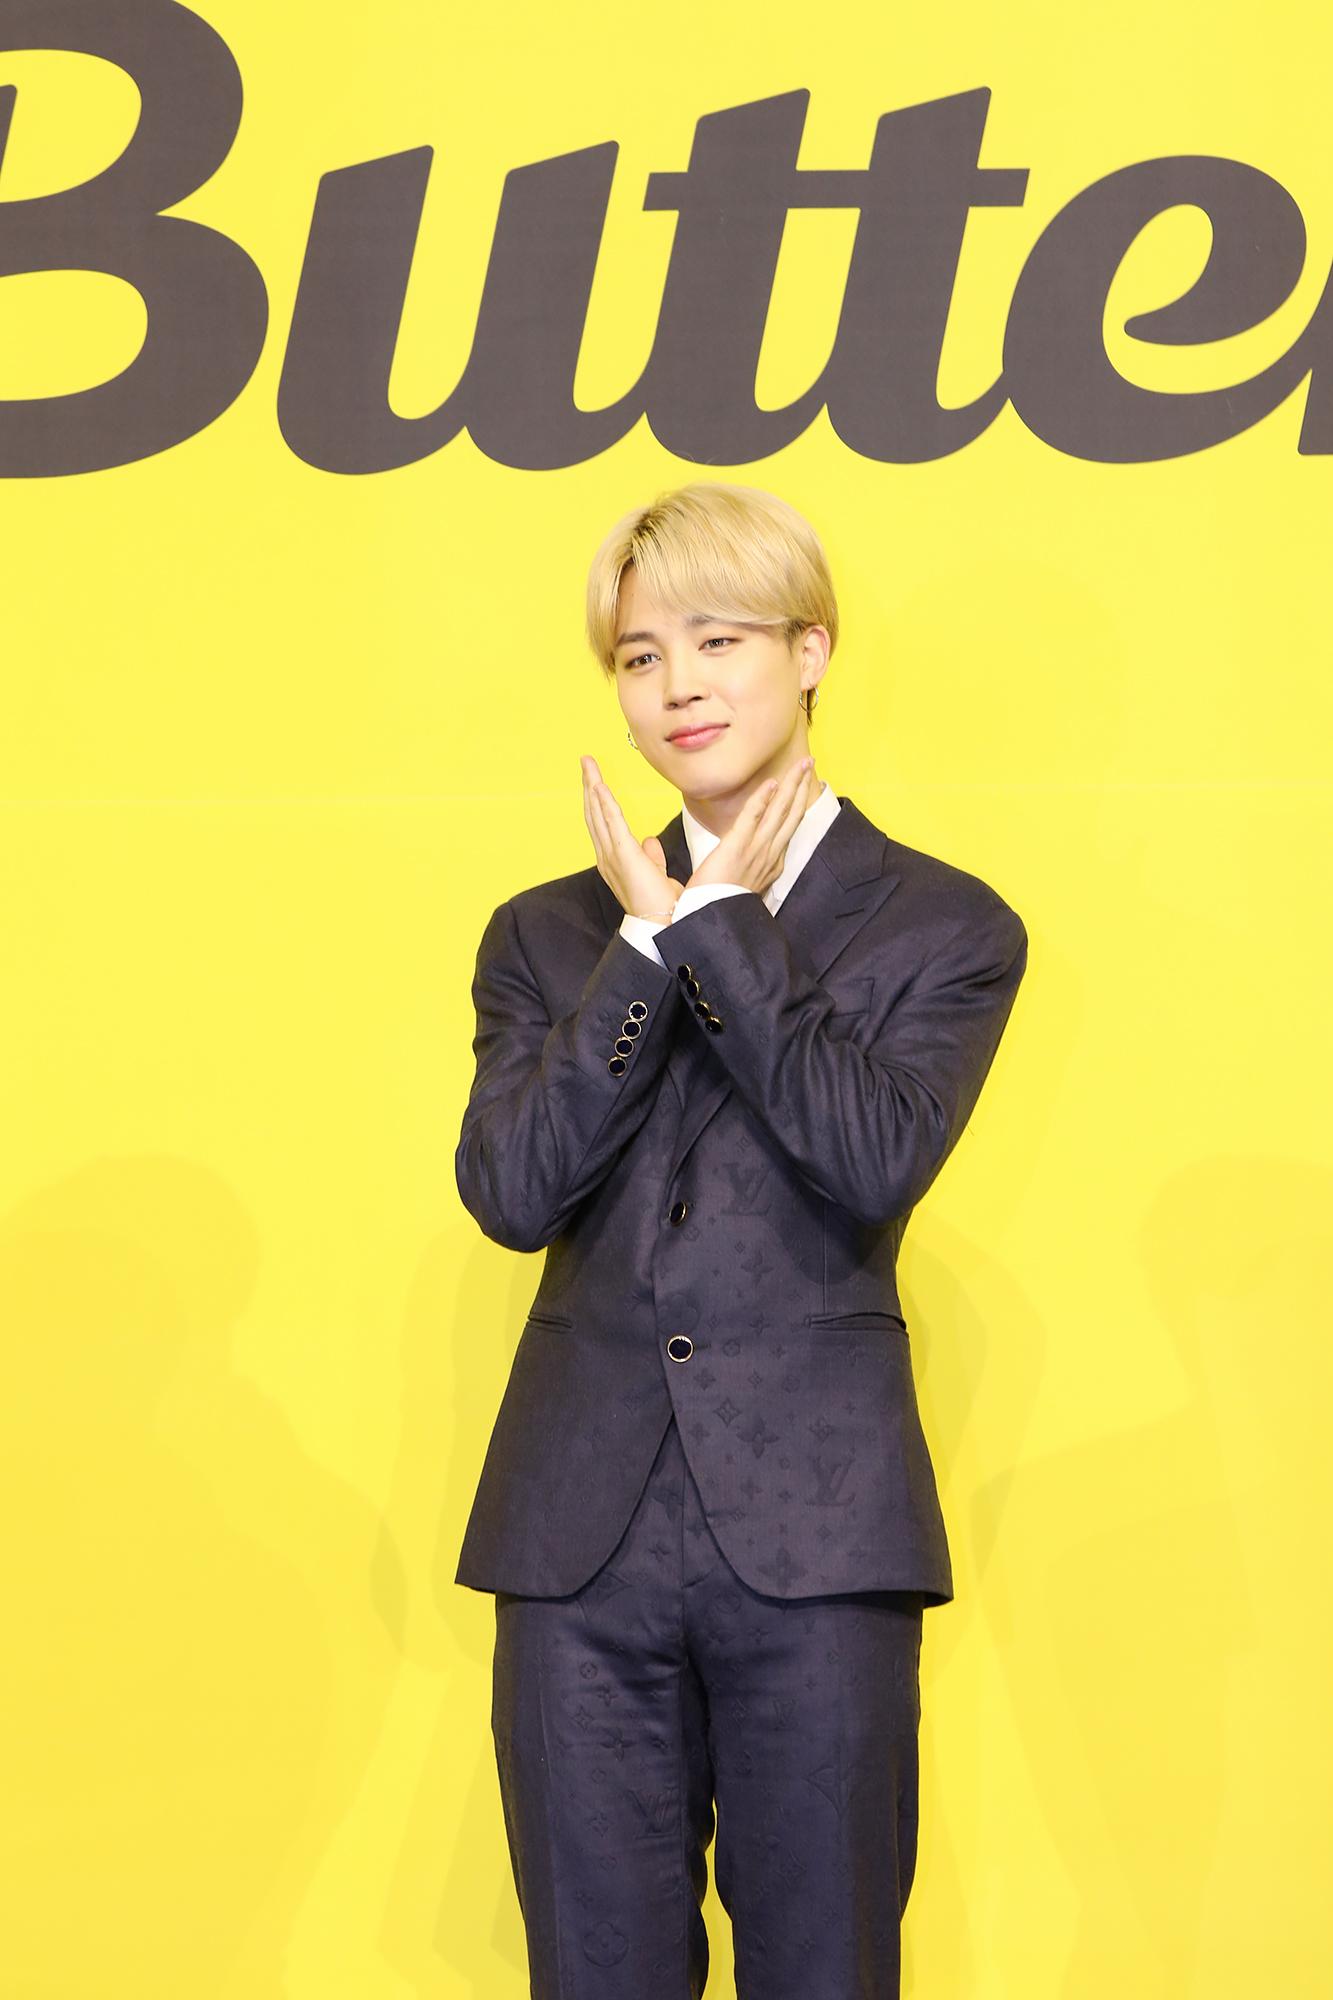 BTS Butter JIMIN オンライン記者会見